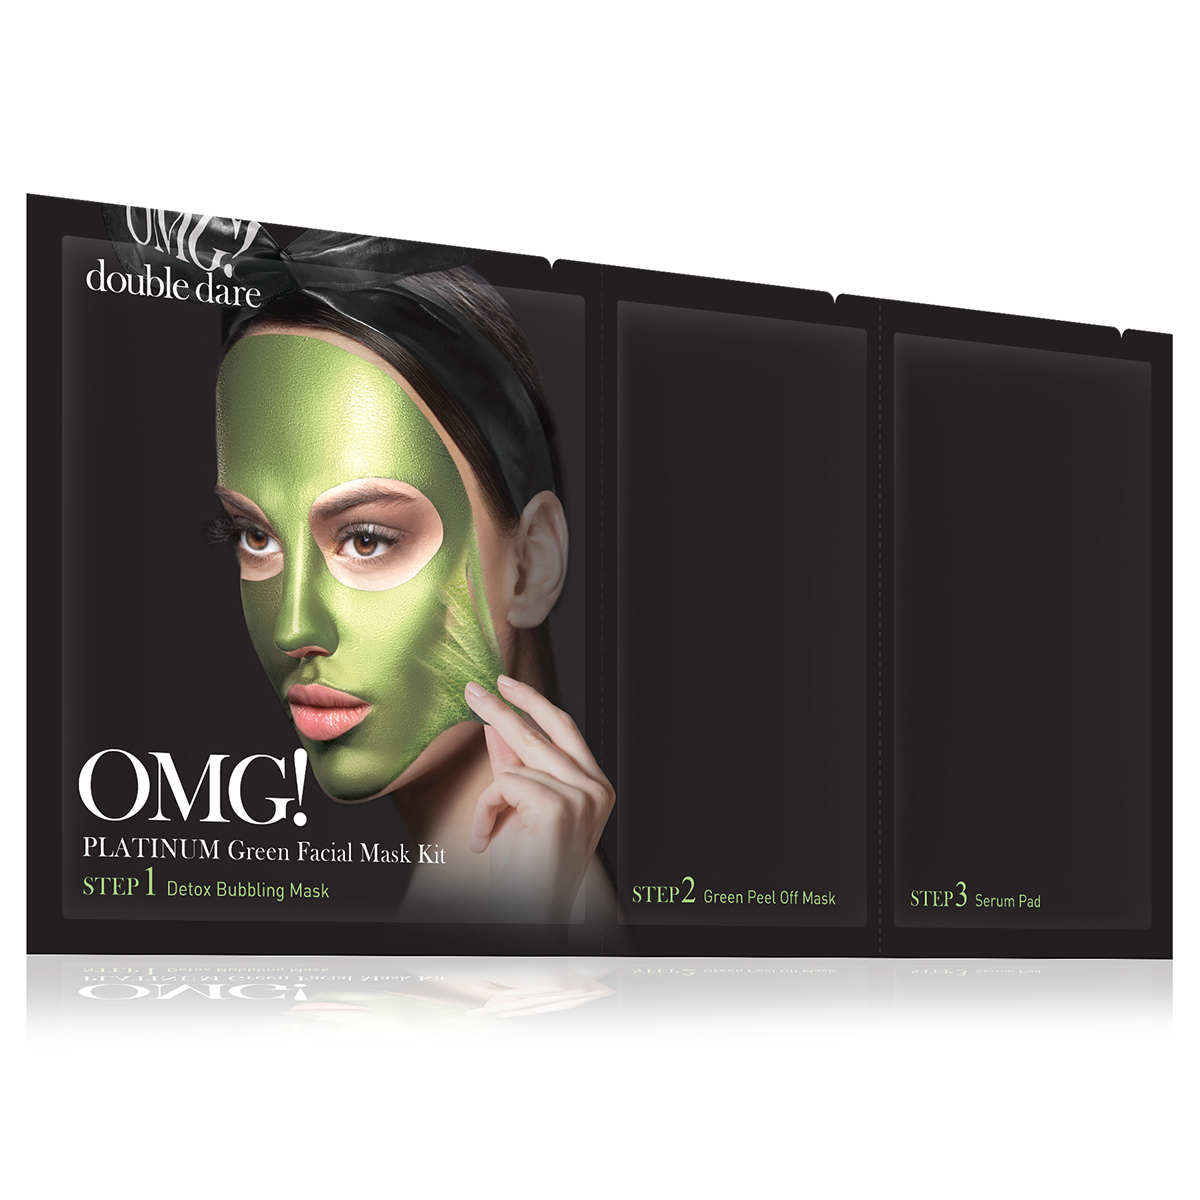 Double Dare OMG! Platinum Green Facial Mask Kit Маска трехкомпонентная для ухода за кожей лица зеленая double dare omg маска трехкомпонентная для восстановления волос 3in1 kit hair repair system